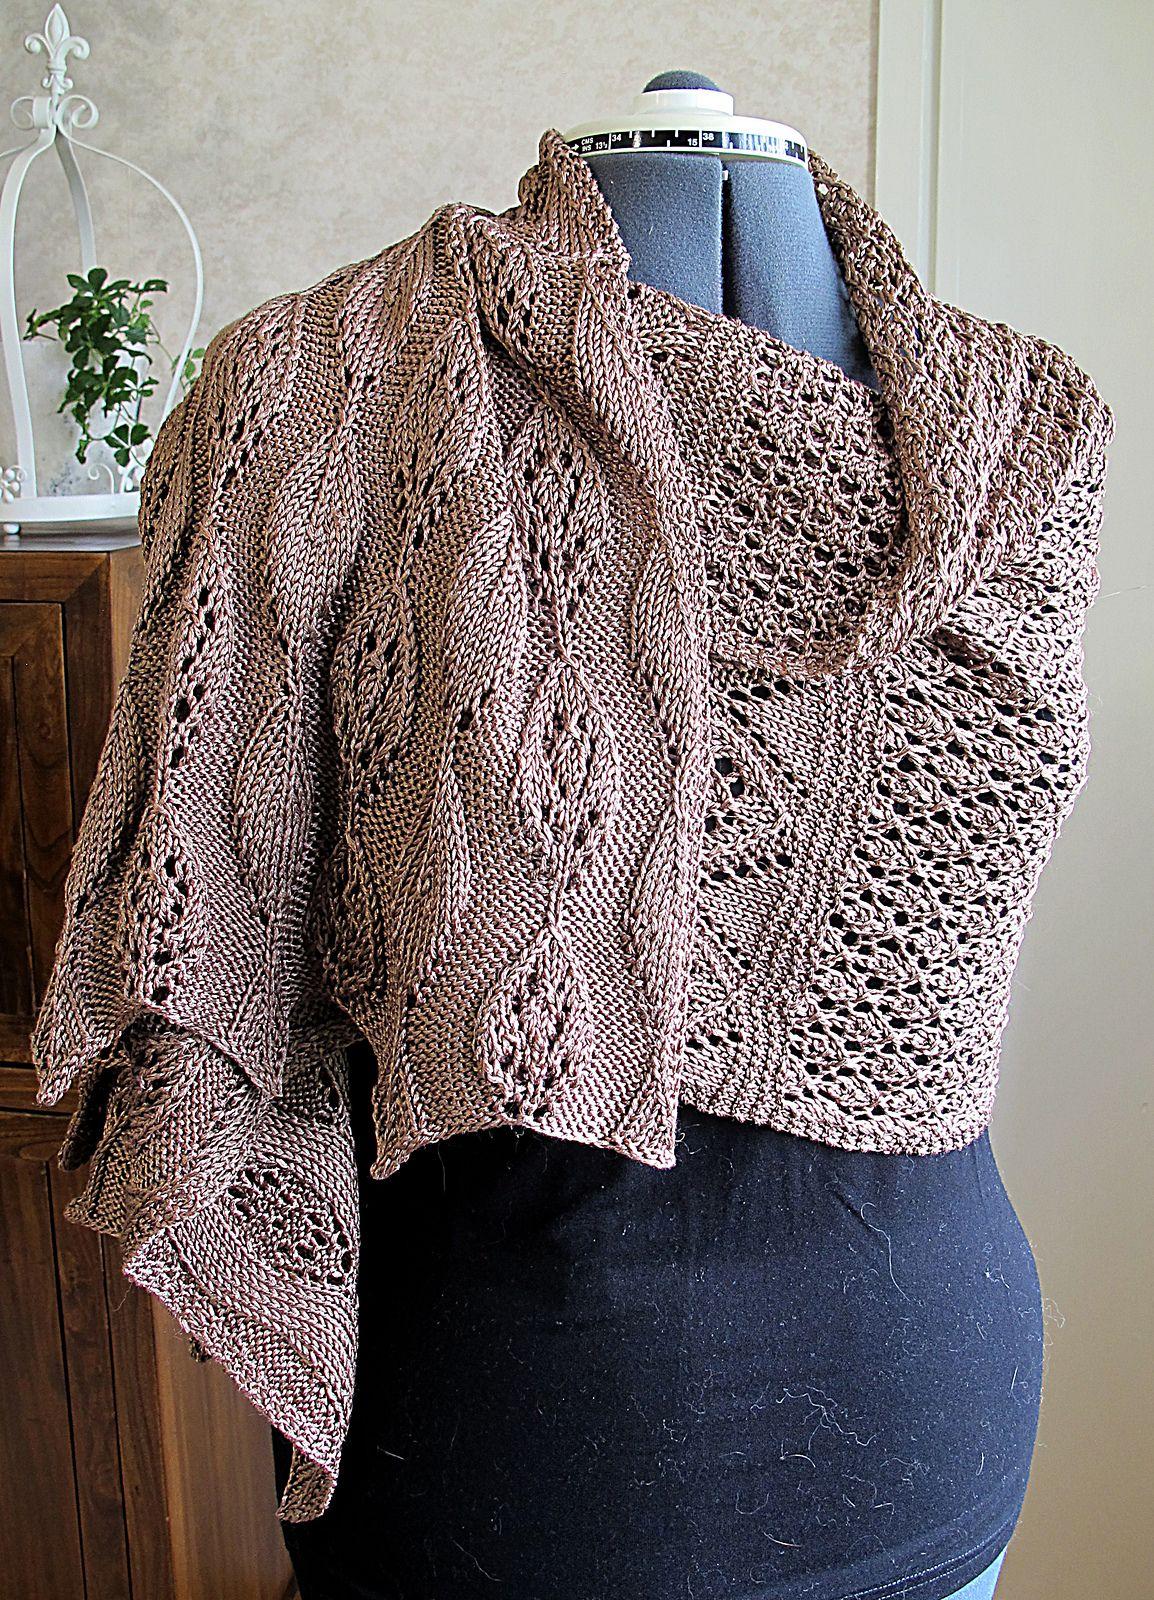 Rift Shawl By Noora Laivola - Free Knitted Pattern - (ravelry ...